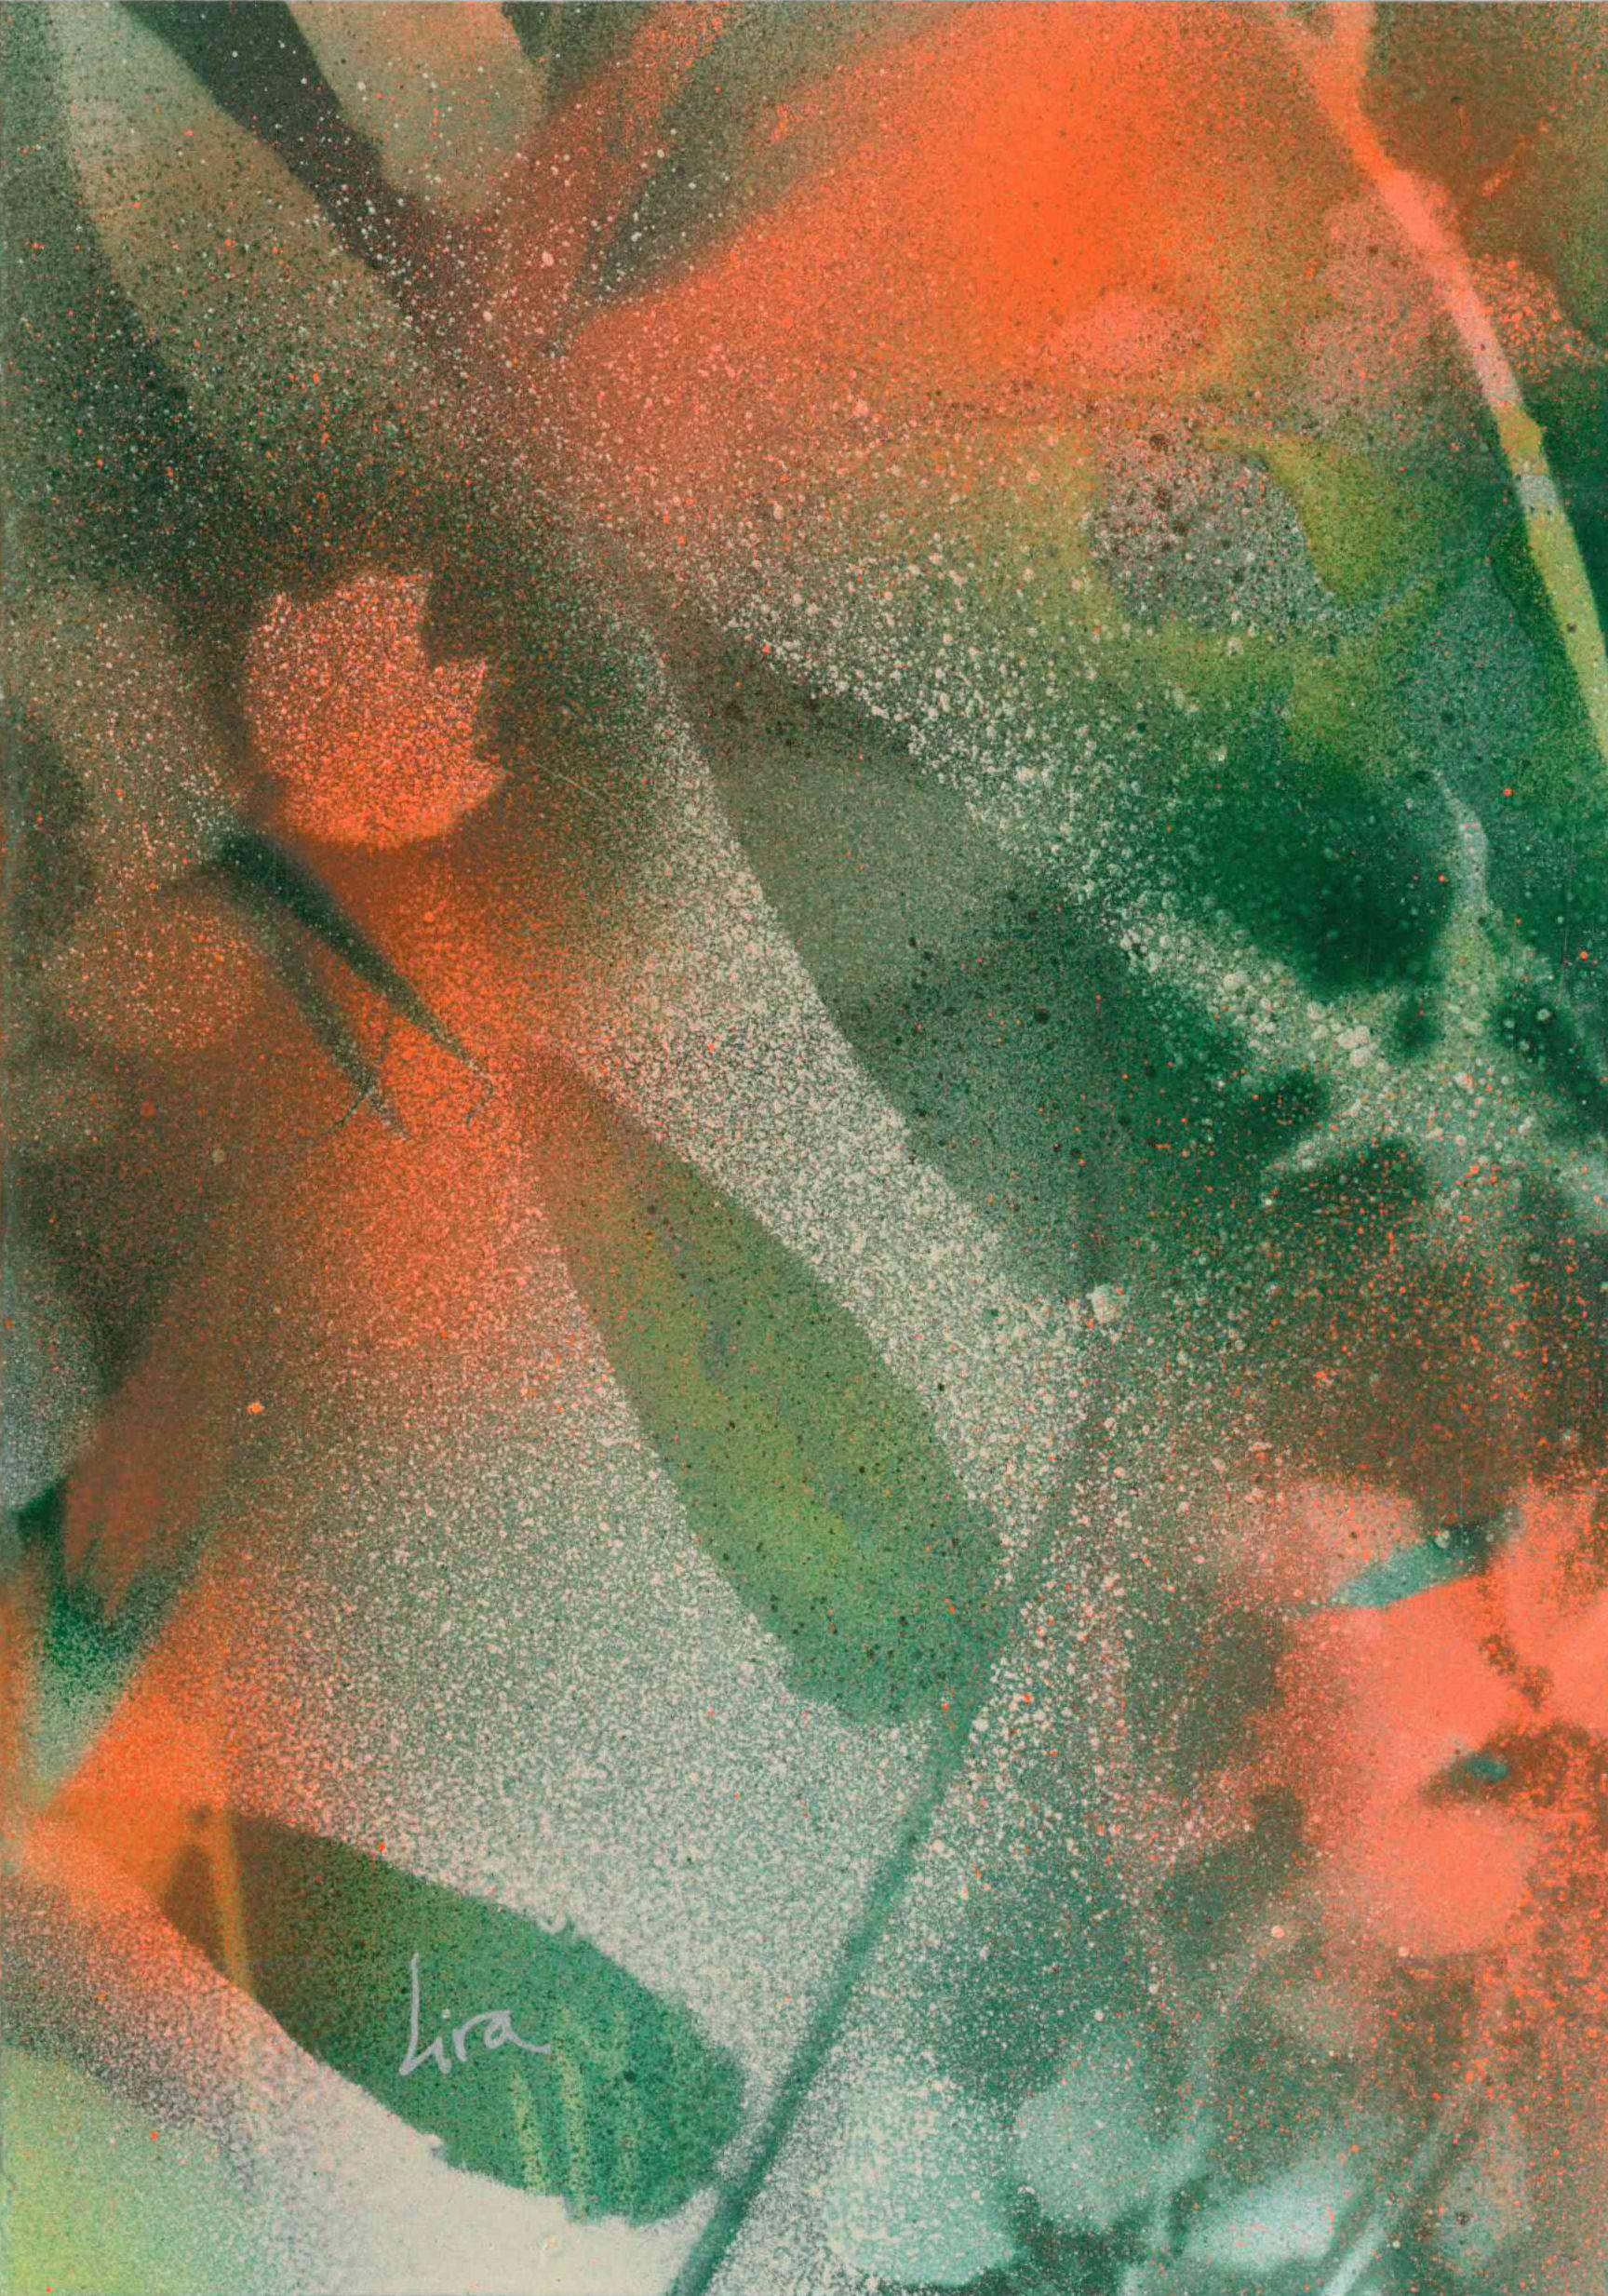 "Tarjeta original pintada por Lira titulada ""Naturaleza""."